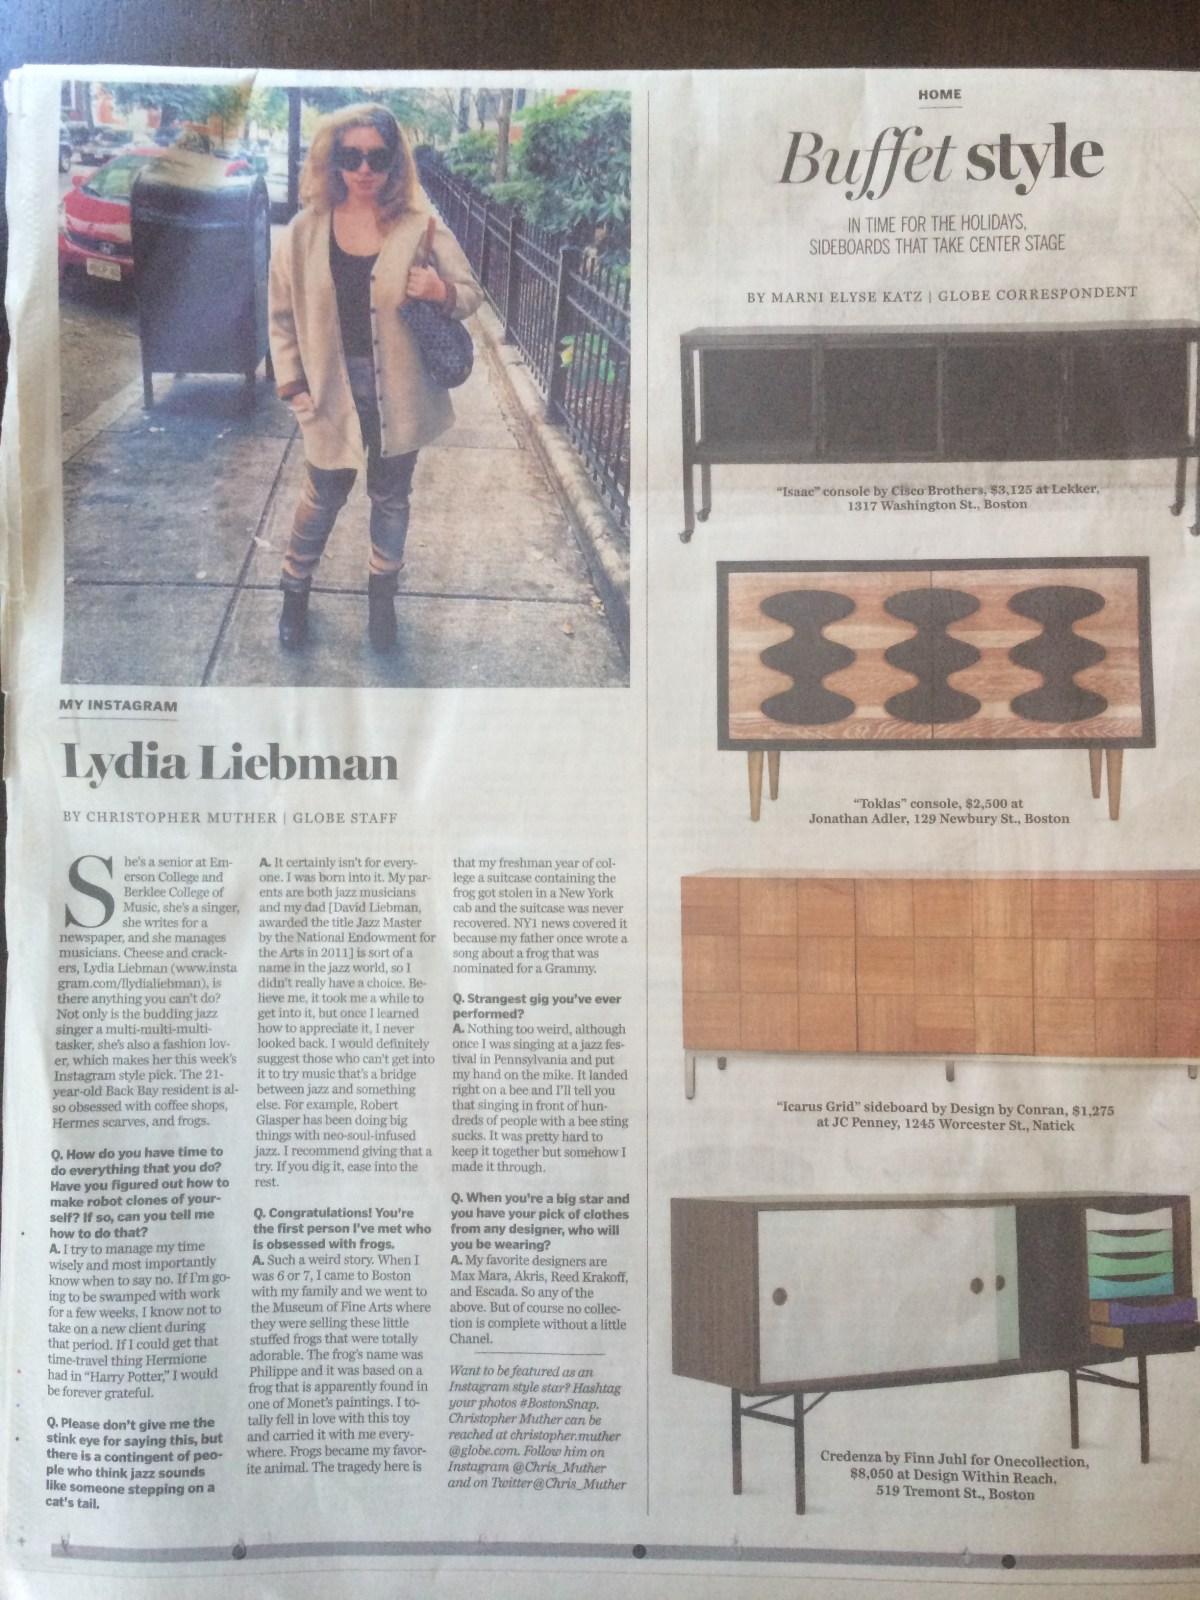 The Boston Globe, 11/2013 Full Article here: http://www.bostonglobe.com/lifestyle/style/2013/11/09/instagram-lydia-liebman/44eWYj0TOklvgYERDjQipI/story.html